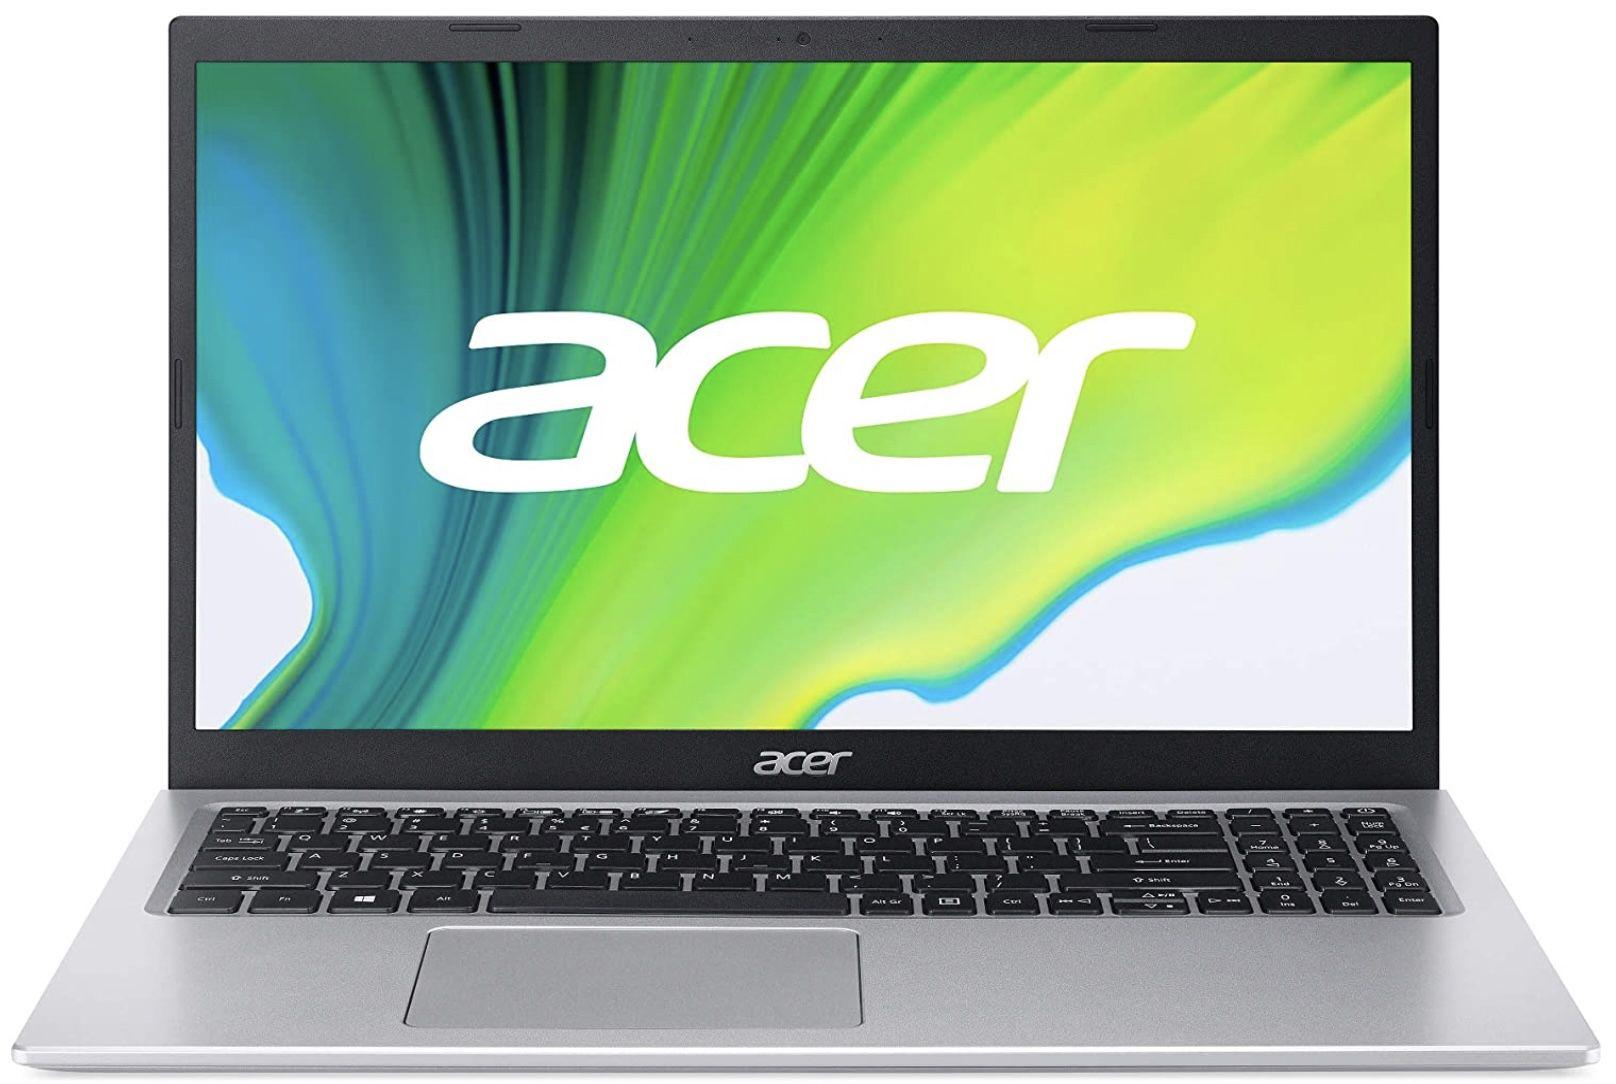 Acer Aspire 5   15,6 Zoll Multimedia Laptop mit 8 GB RAM & 512 GB SSD für 444€ (statt 499€)